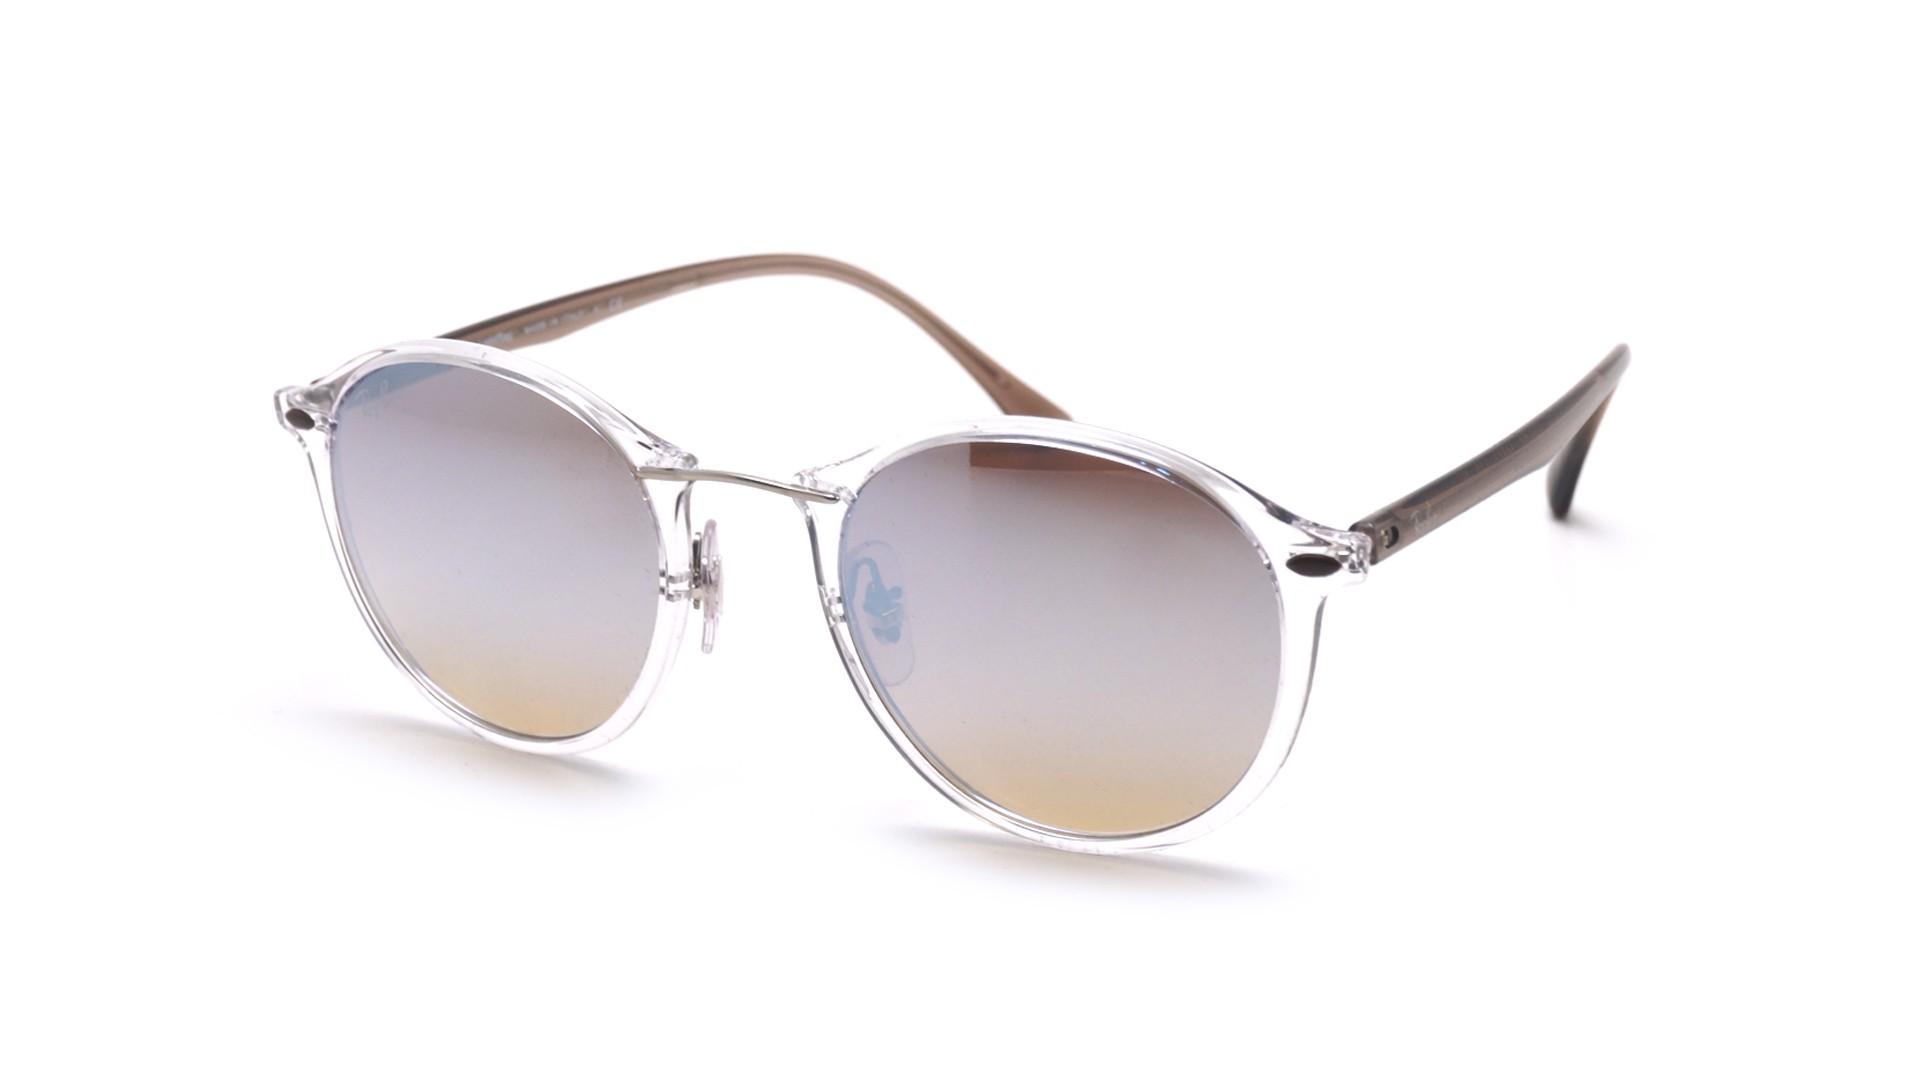 ba19e63d8 Sunglasses Ray-Ban Tech Light Ray Clear RB4242 6290B8 49-21 Medium Mirror